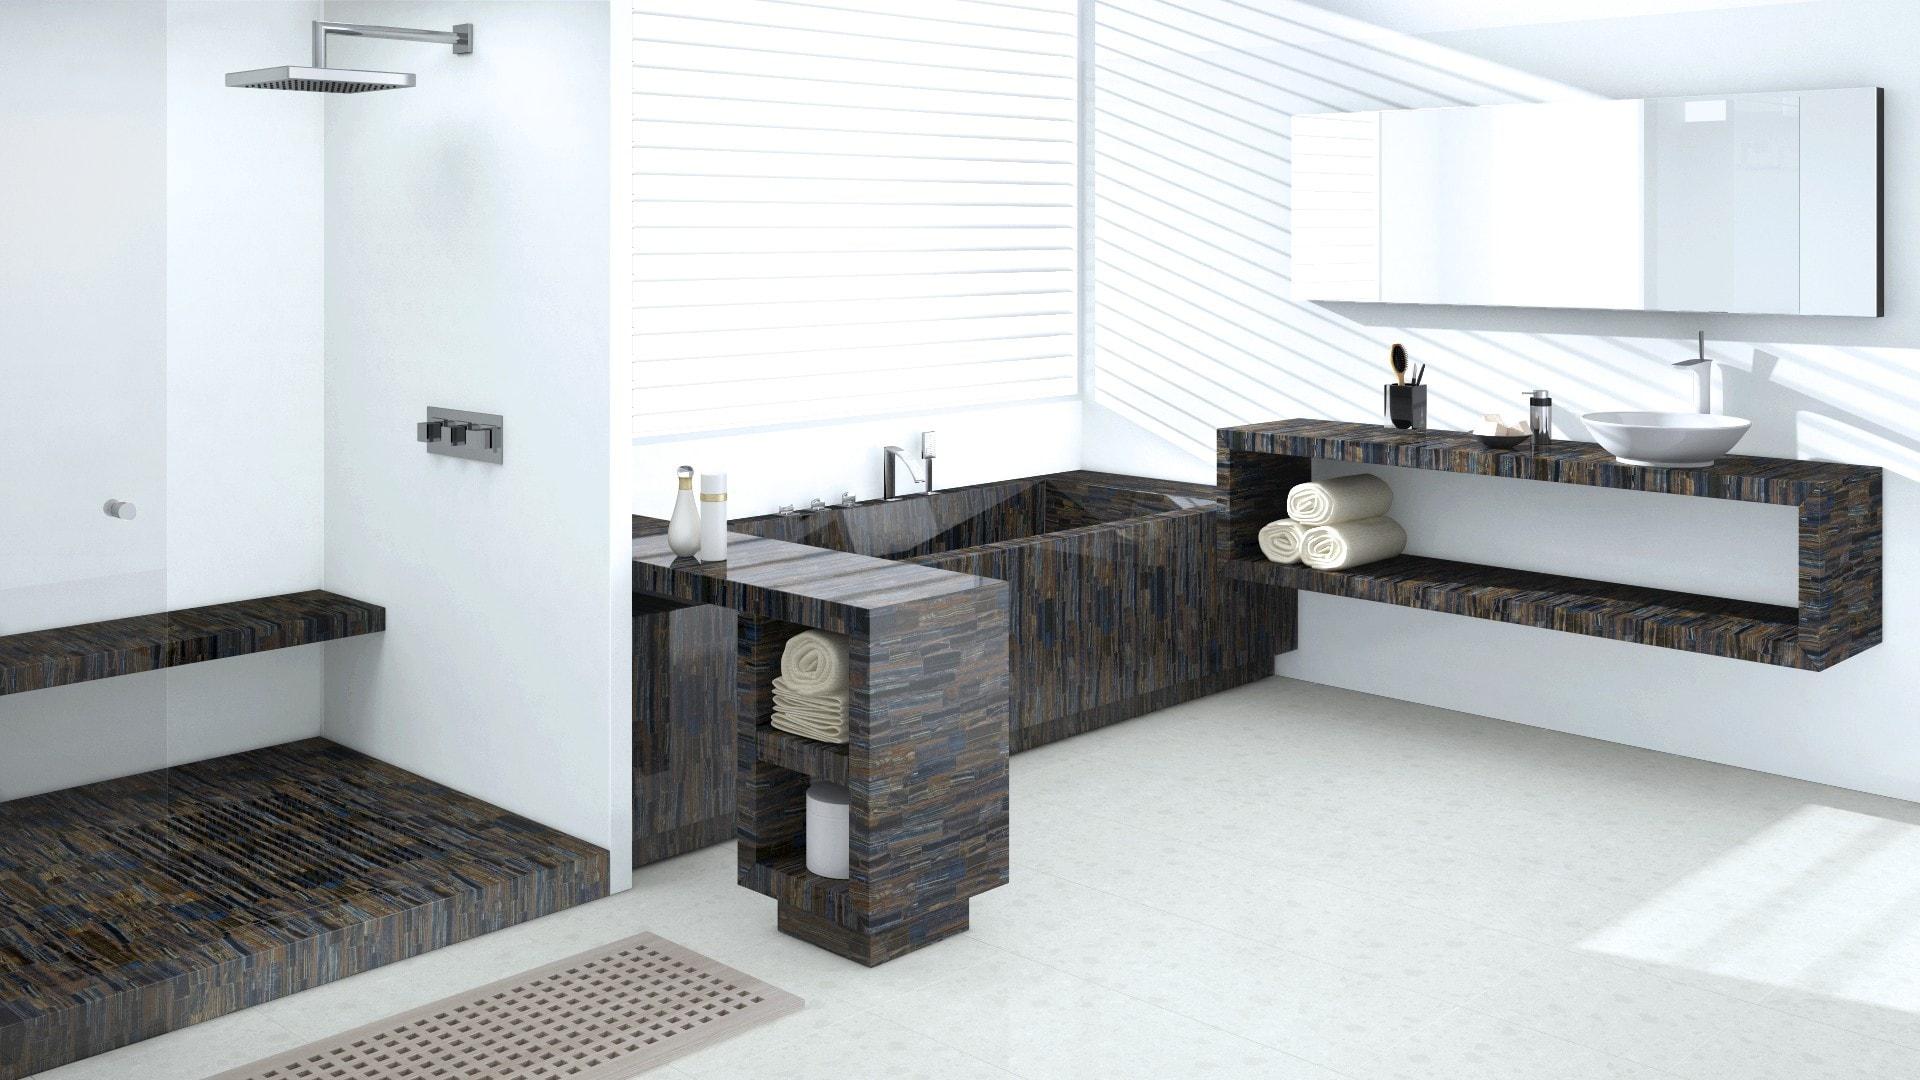 Сaesarstone Countertop Stone modern bathroom design